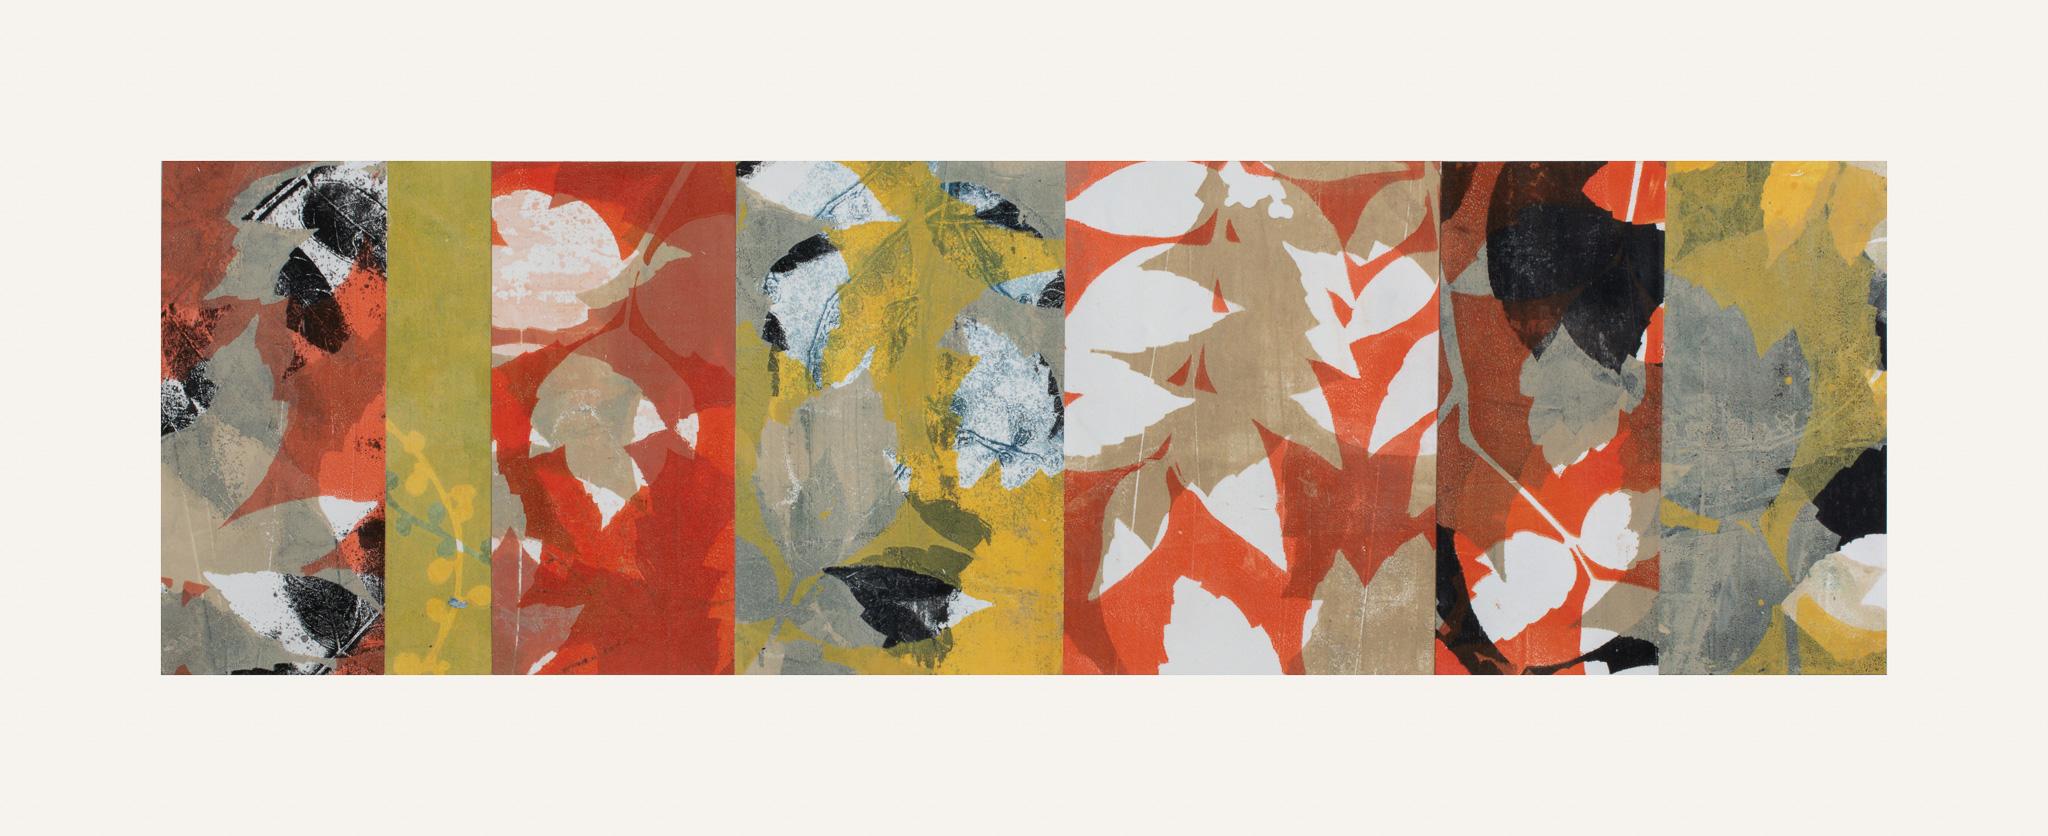 "Autumn Haze 4, 11"" x 30,"" Monoprint collage"